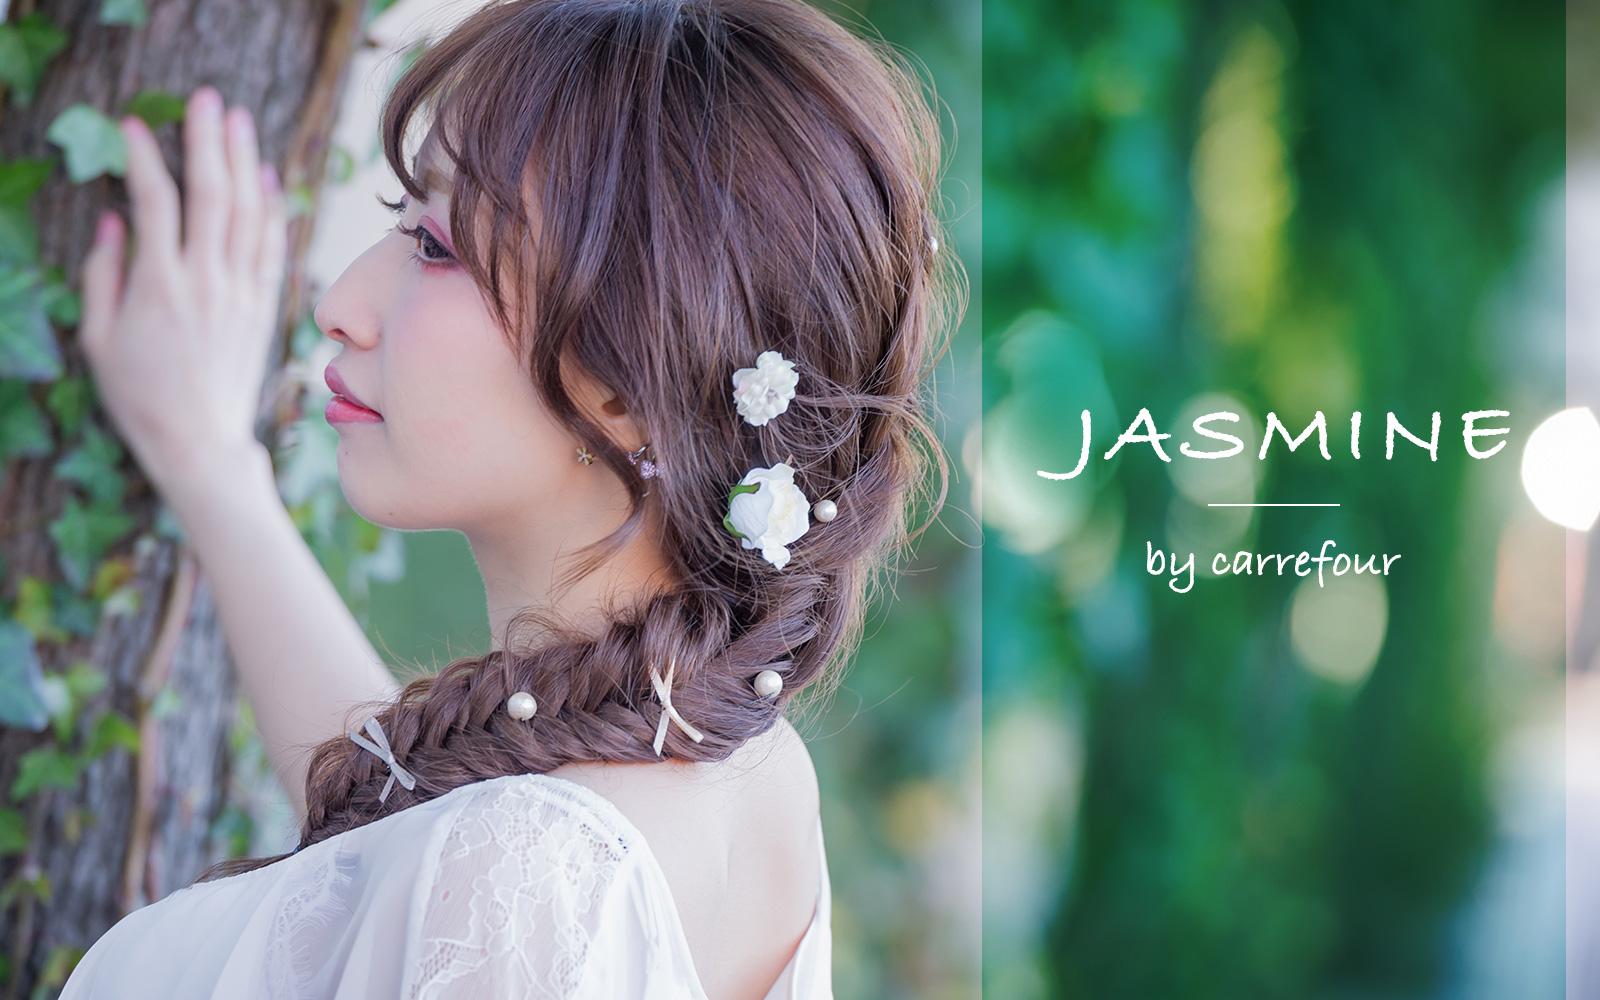 jasmineのバナー